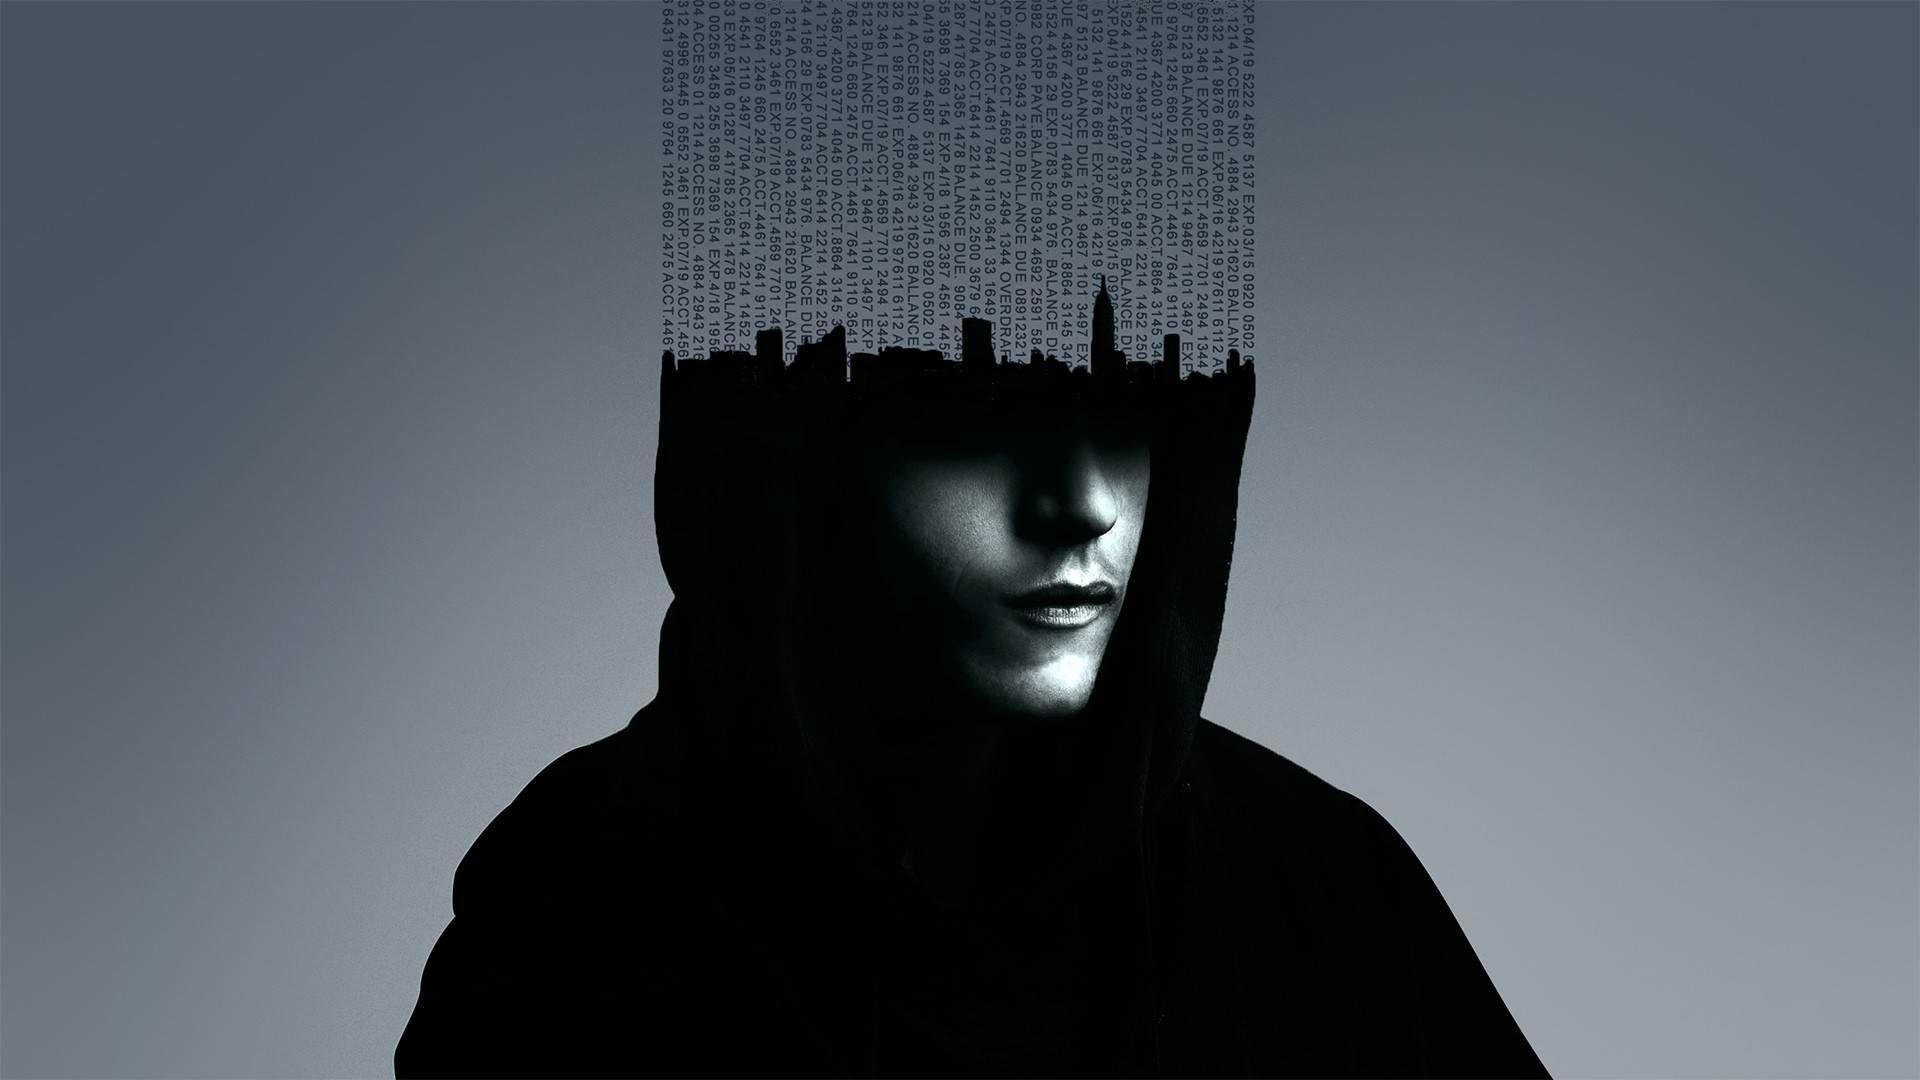 Black Hat Hacker Wallpapers - Wallpaper Cave